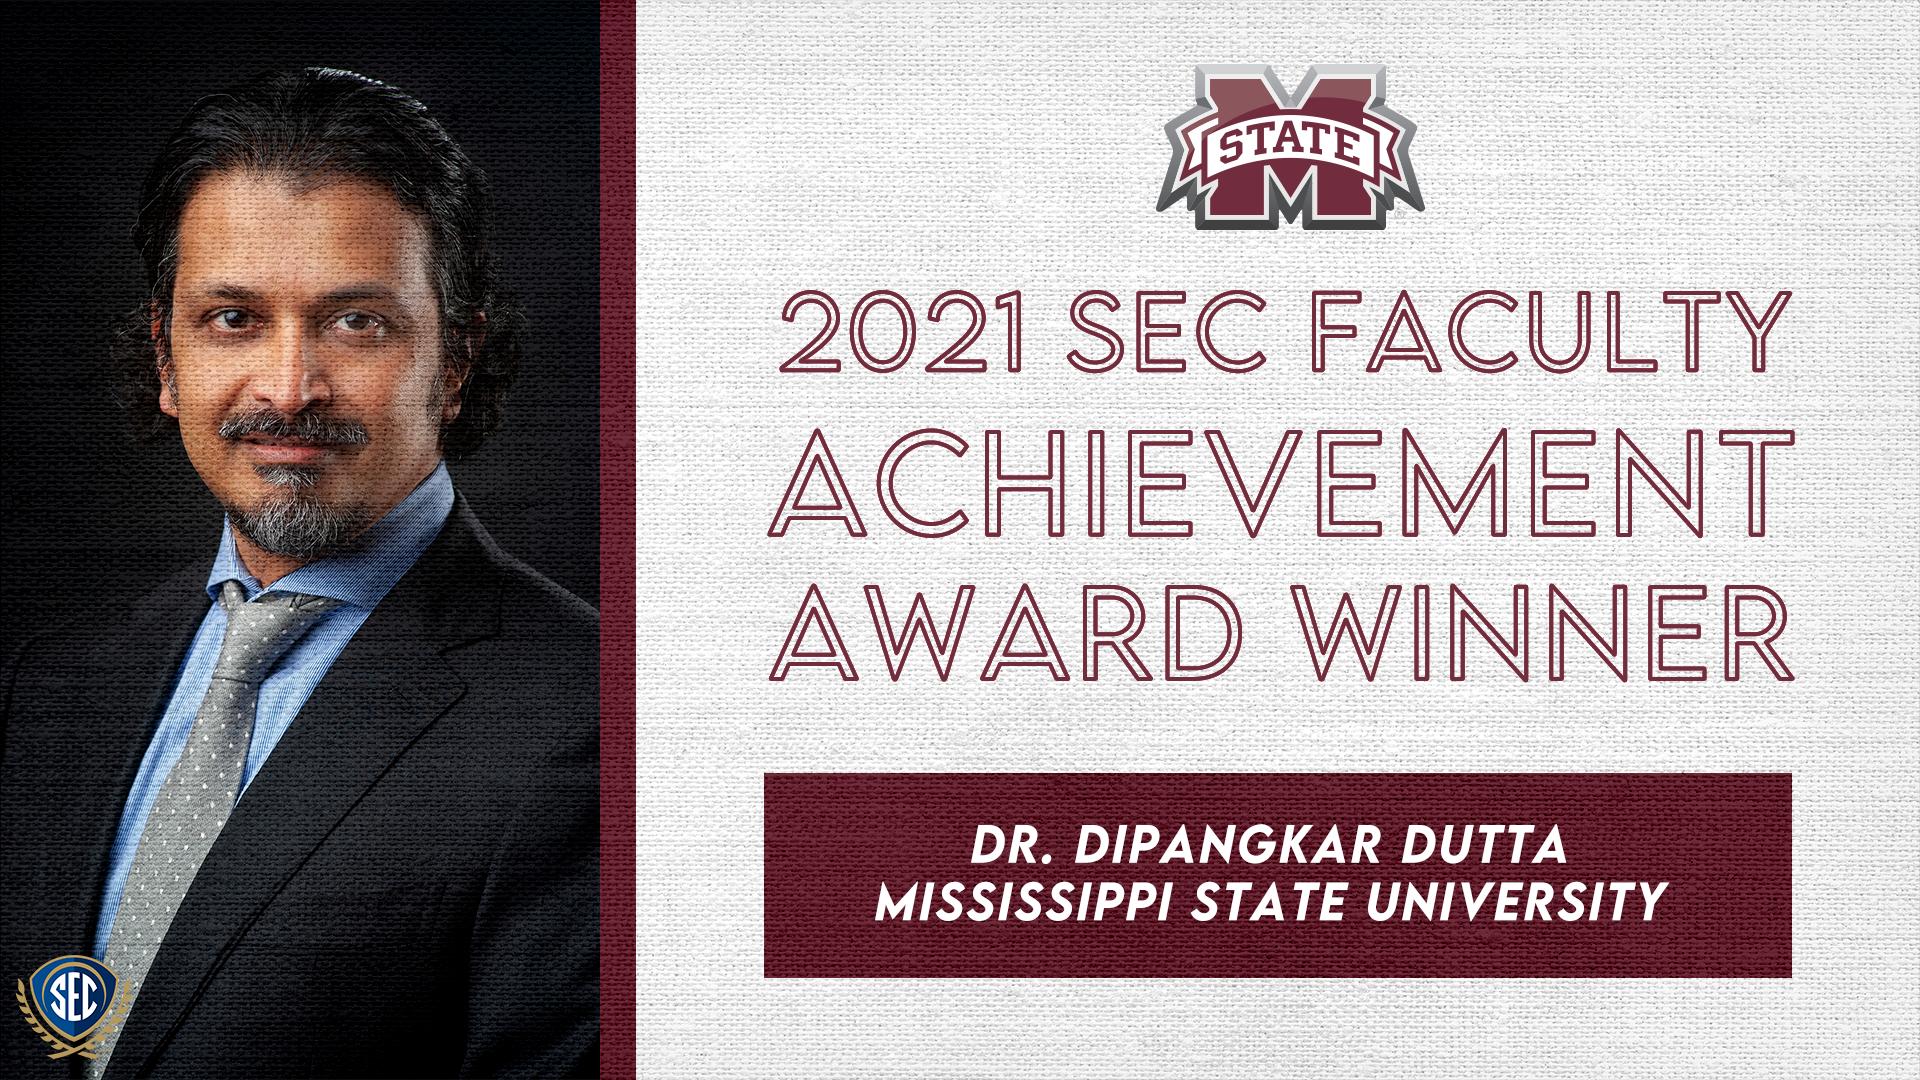 SEC Announces Dr. Dipangkar Dutta Wins 2021 Faculty Achievement Award for Mississippi State University